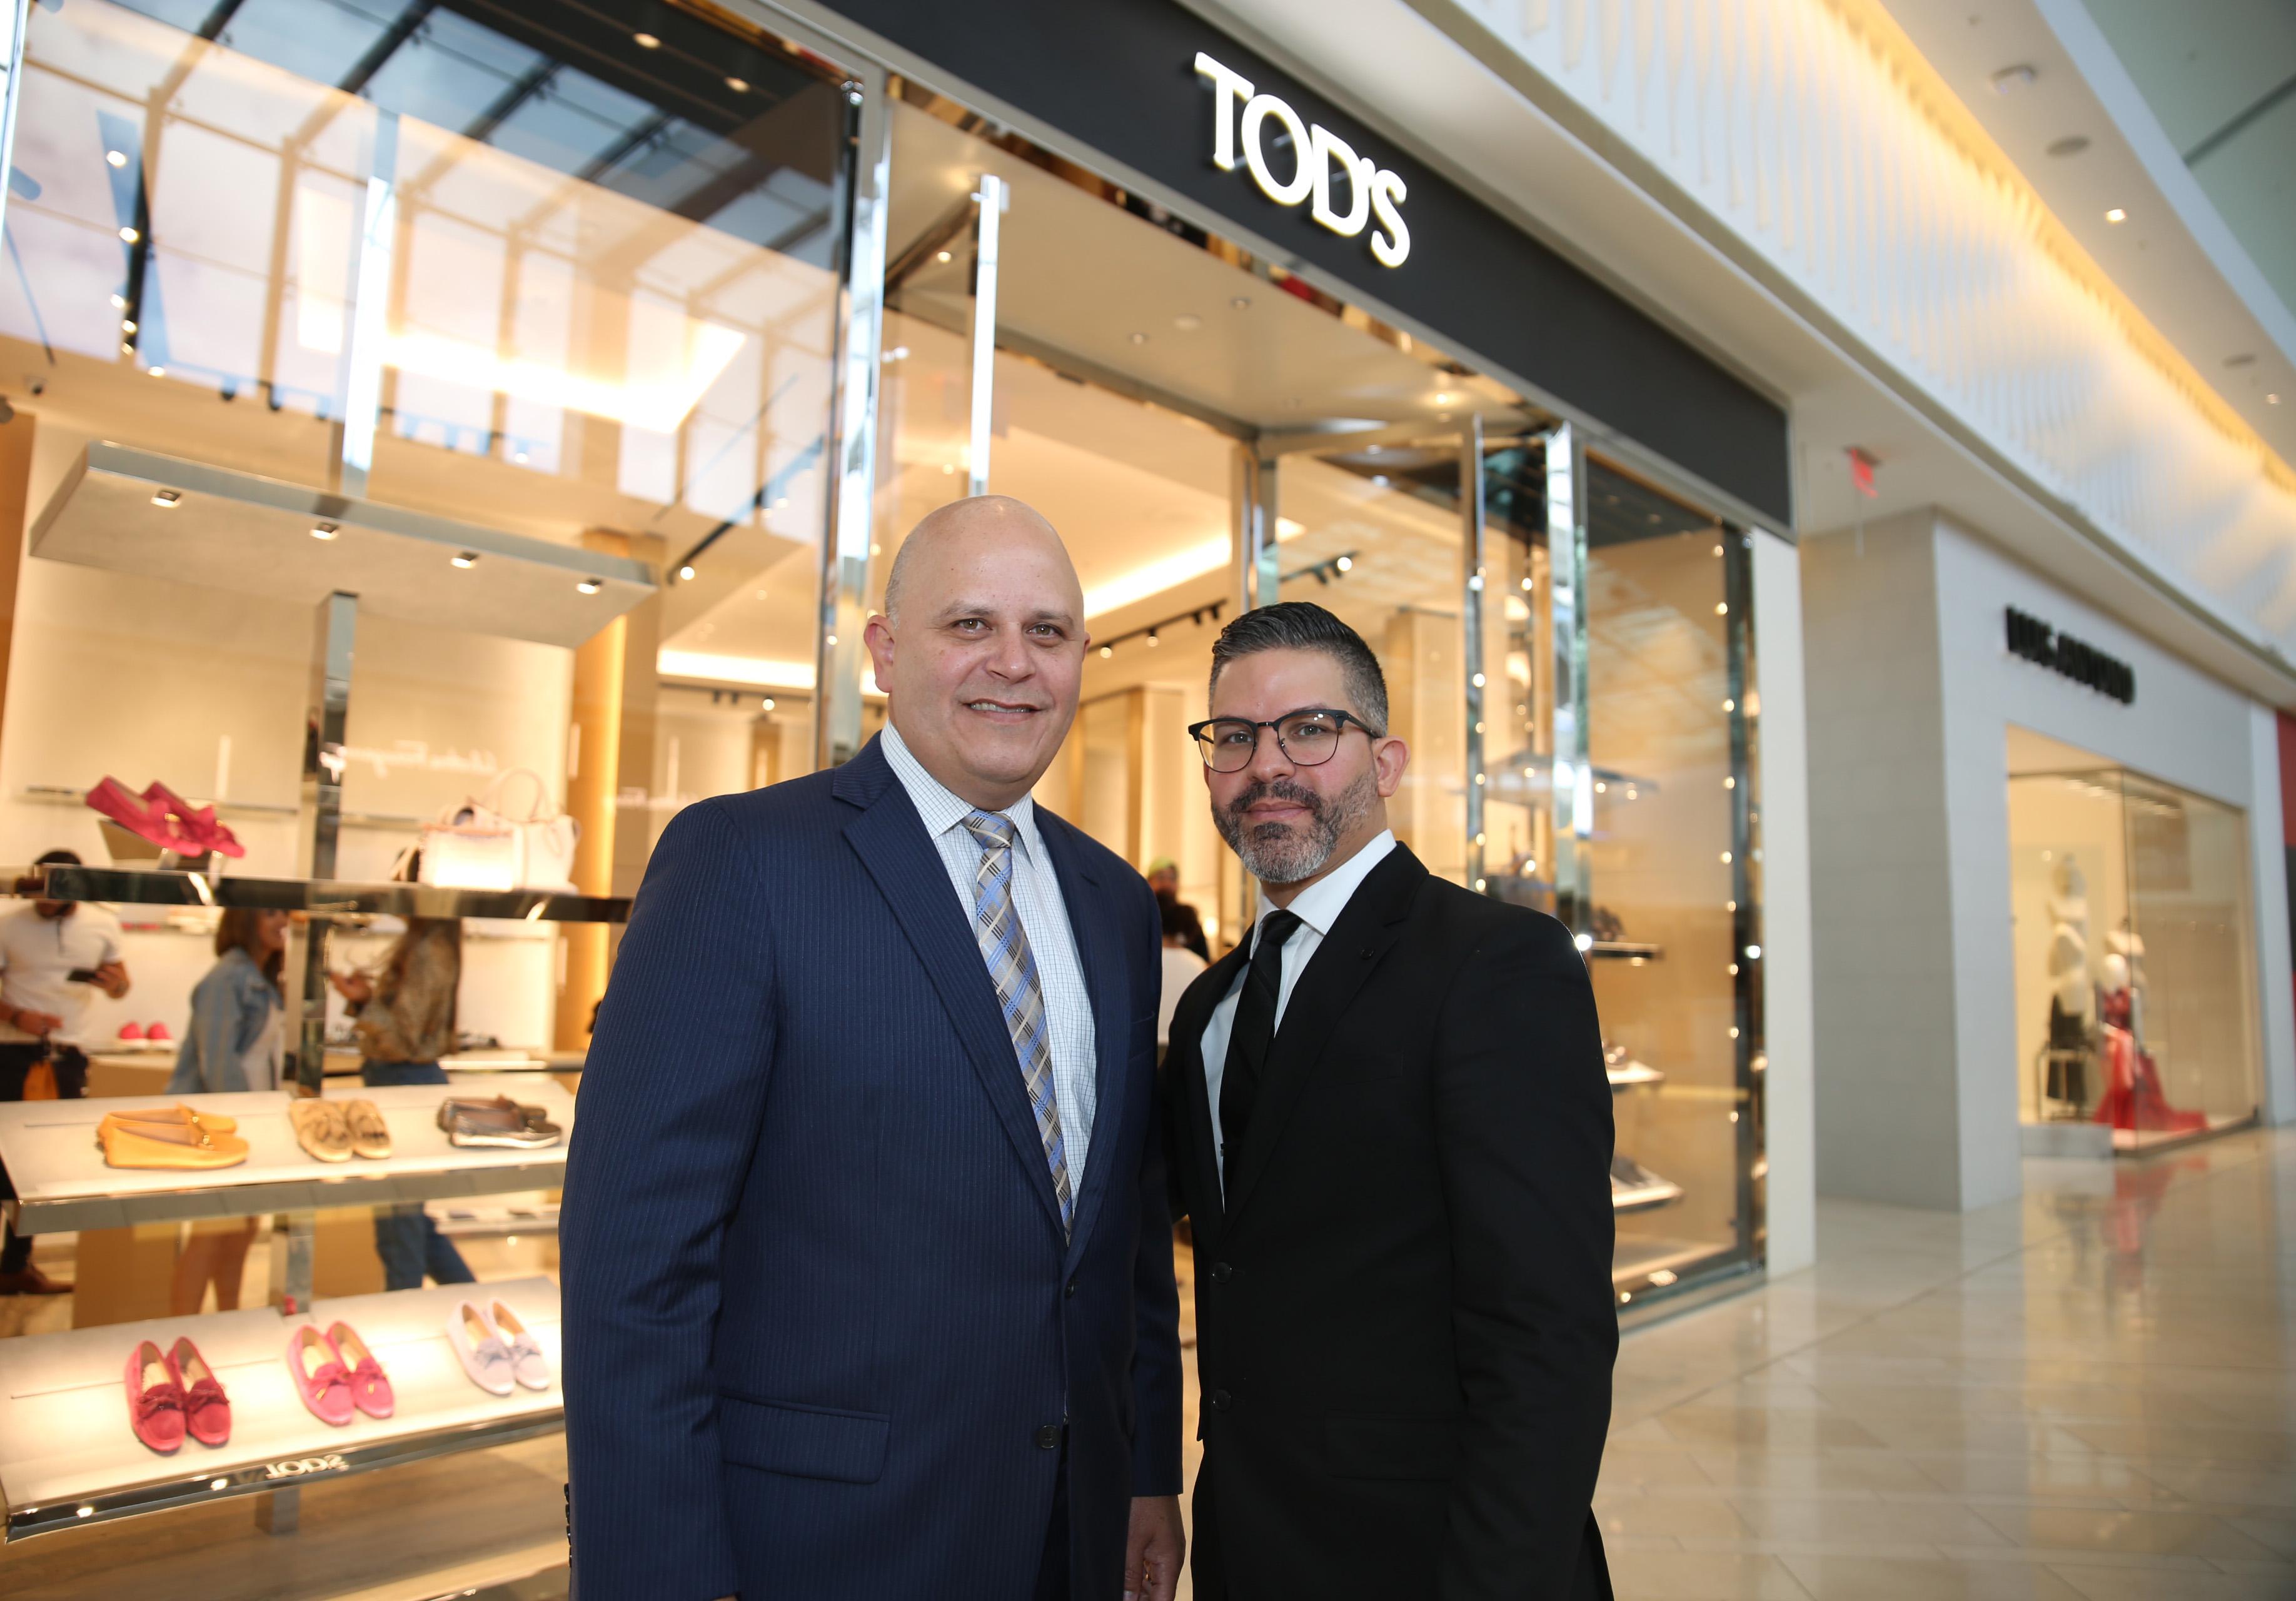 José Ayala, gerente general de The Mall of San Juan, junto a Carlos Vélez, gerente general de Tod's. (Suministrada)